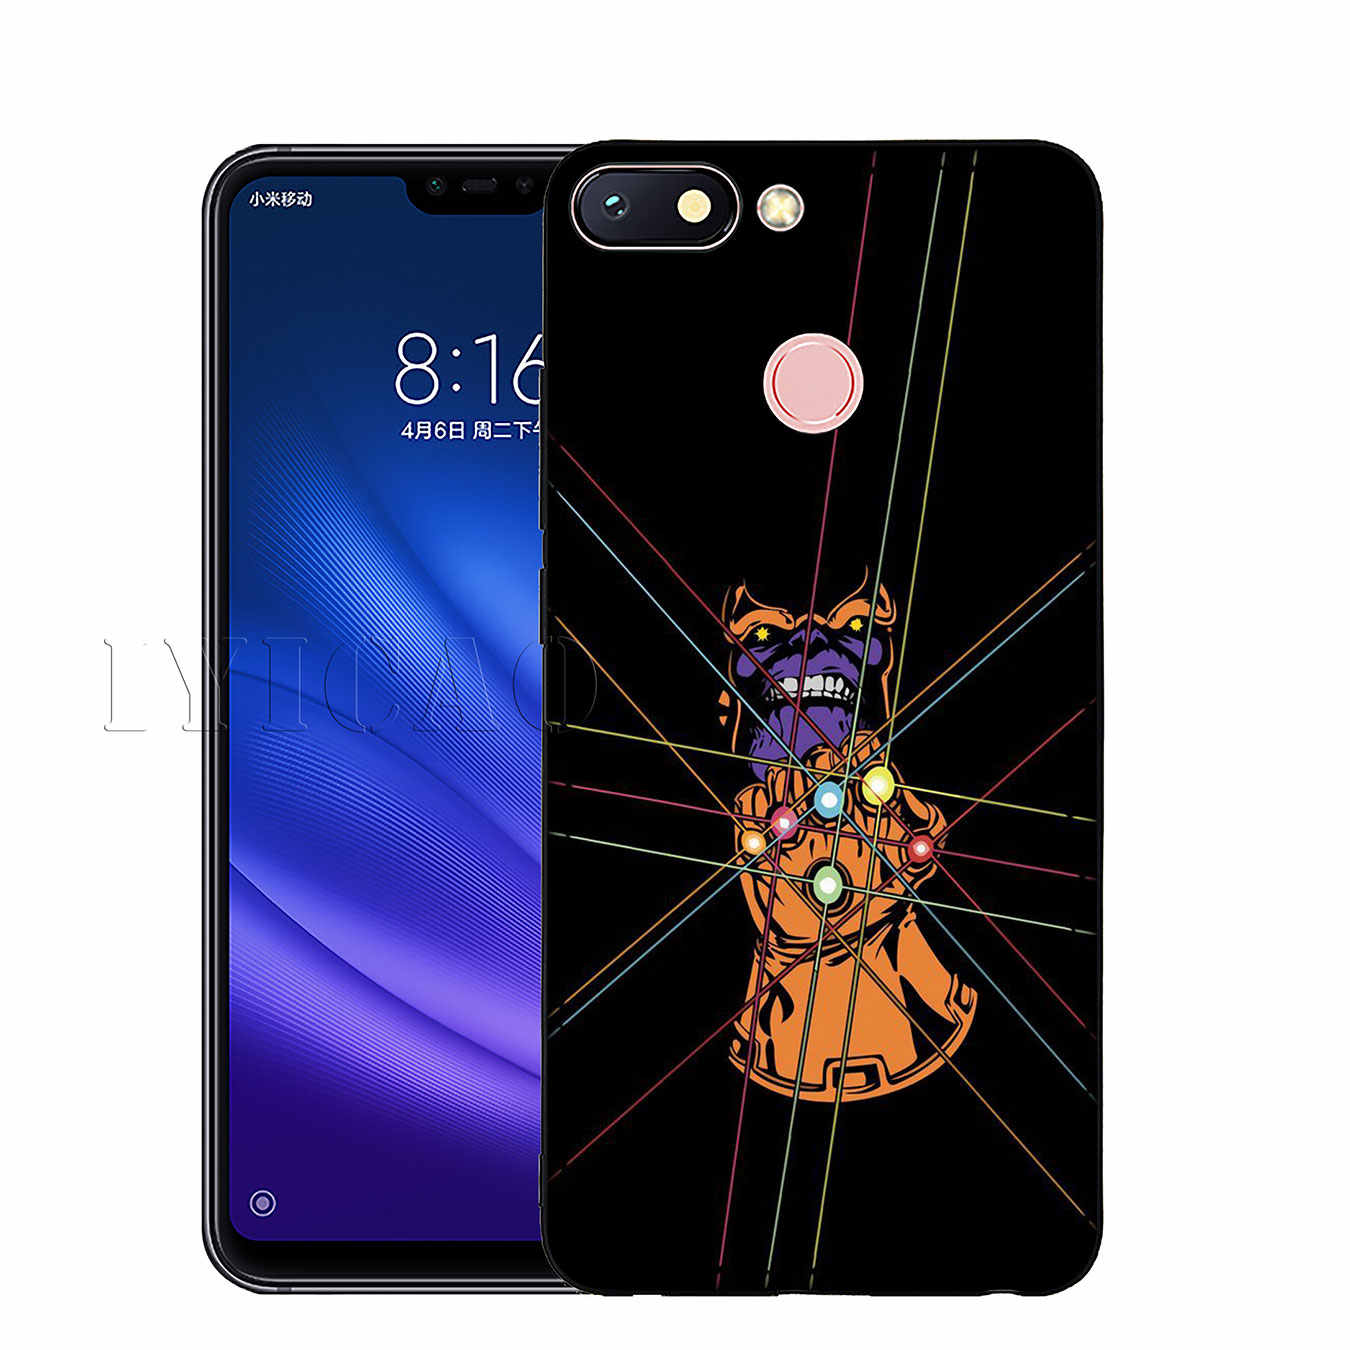 IYICAO Os Vingadores Thanos Maravilha Suave Silicone Caso Telefone para Xiao mi mi 9 SE 9T CC9 CC9E 8 a3 Pro A1 A2 Lite f1 MAX 3